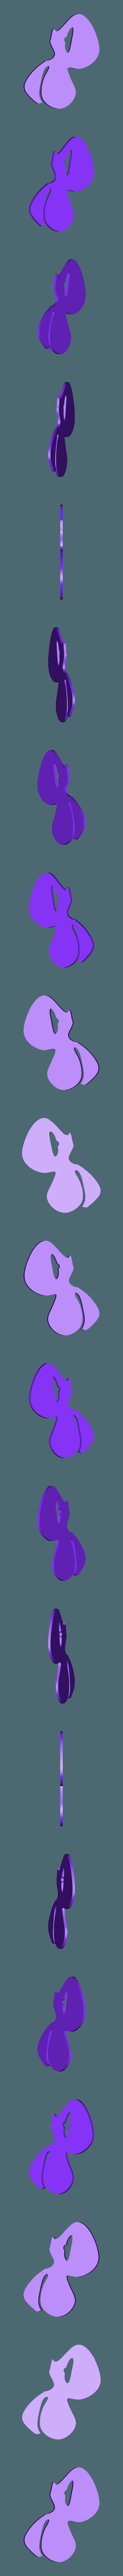 Wattles.stl Download free STL file Chicken - Harvest Moon • 3D printer object, JayOmega